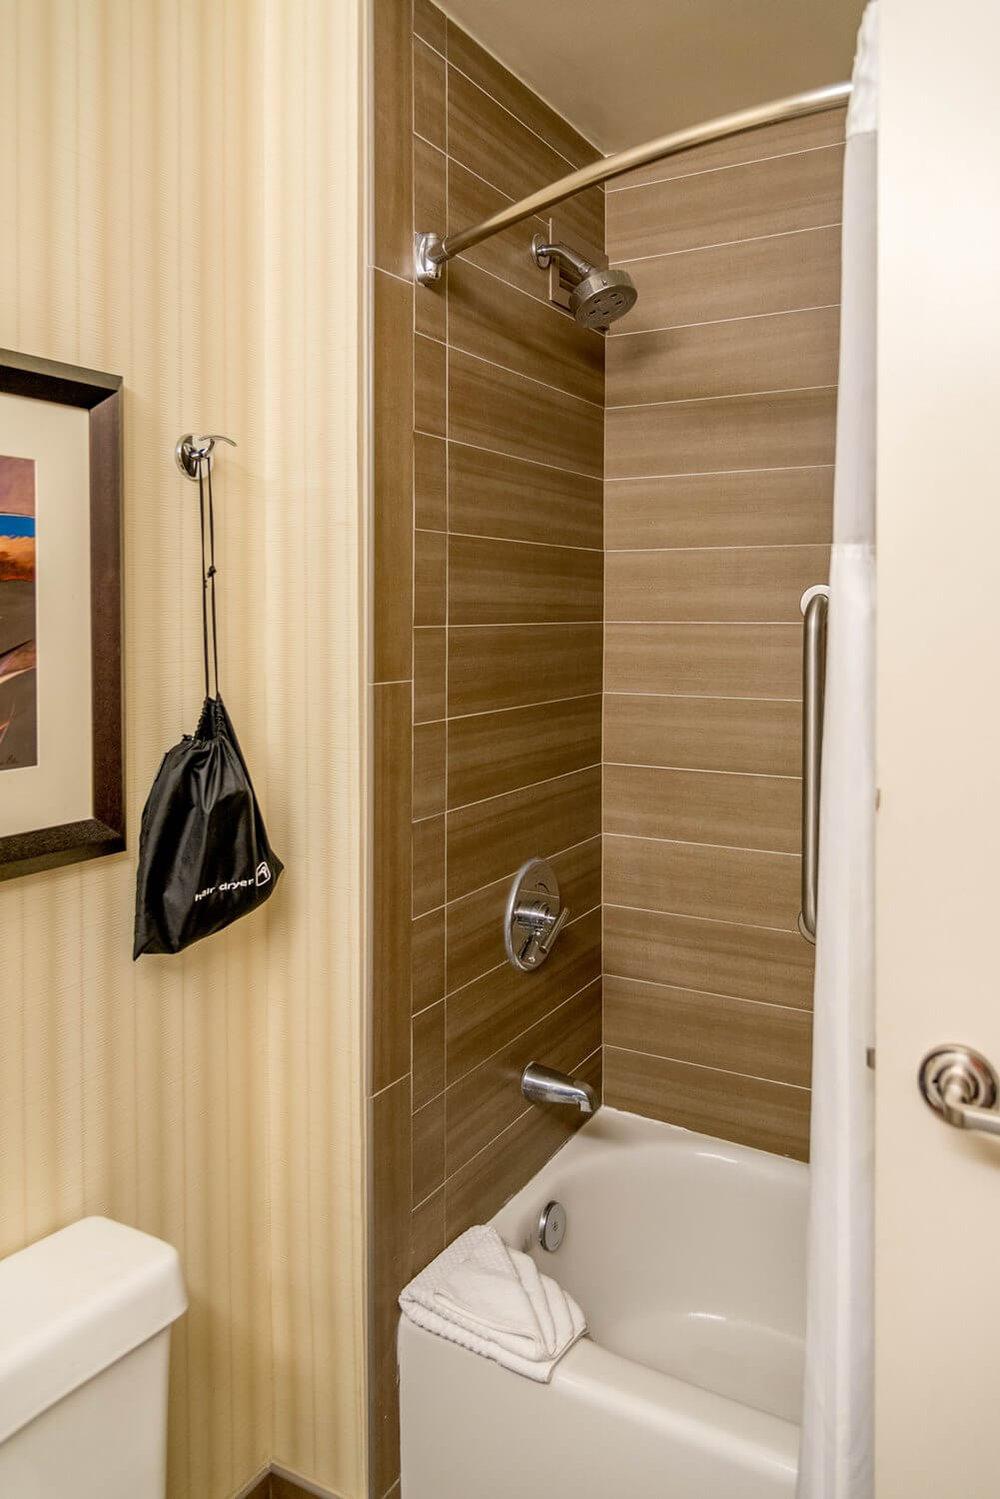 Bathtub/Shower at DoubleTree Suites by Hilton Orlando - Disney Springs Resort Area